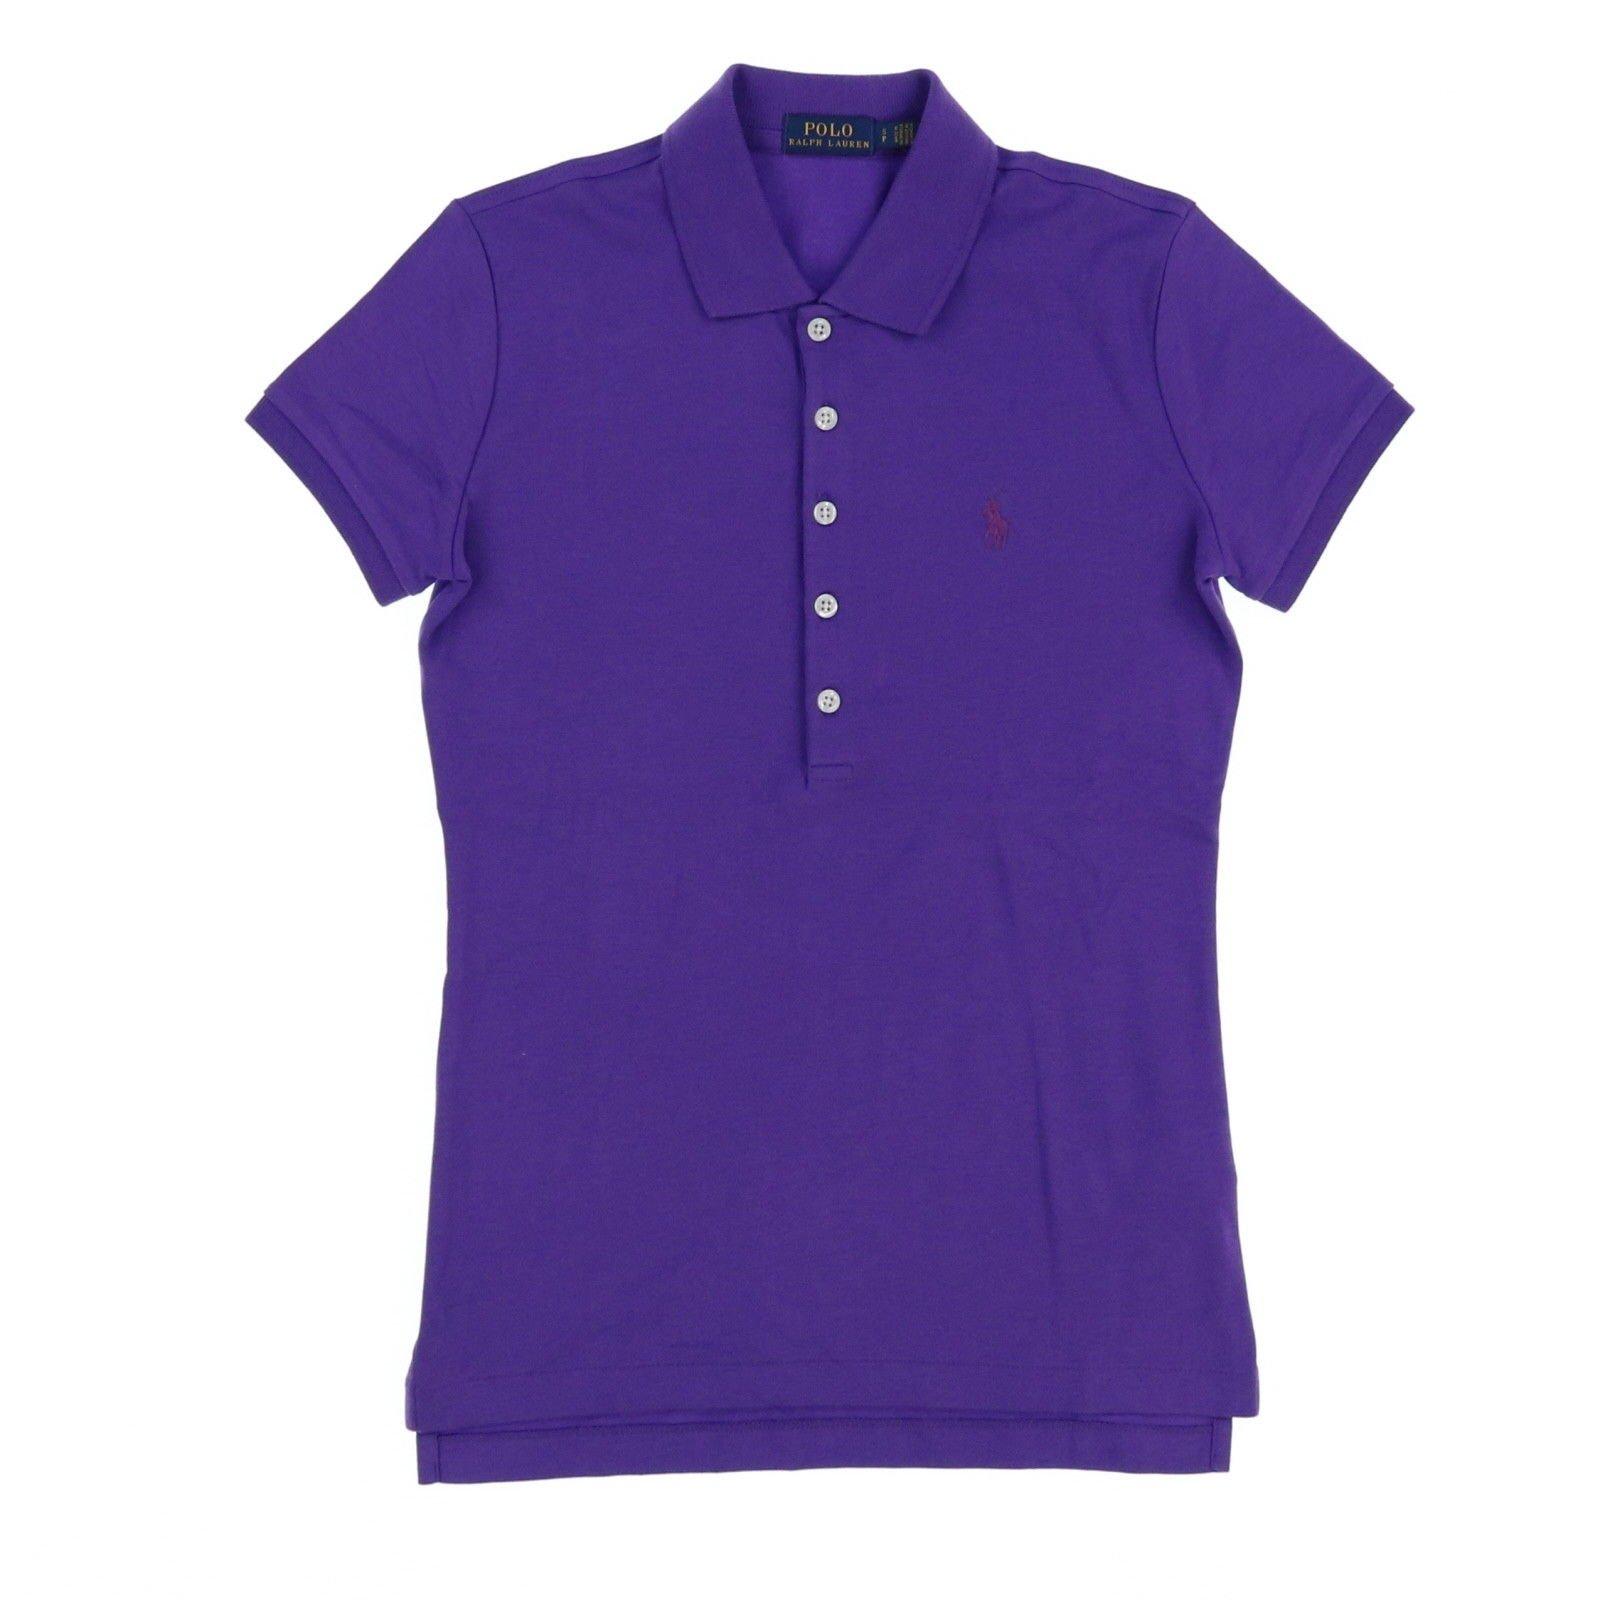 Polo Ralph Lauren Womens Polo Shirt (Medium, Purple)